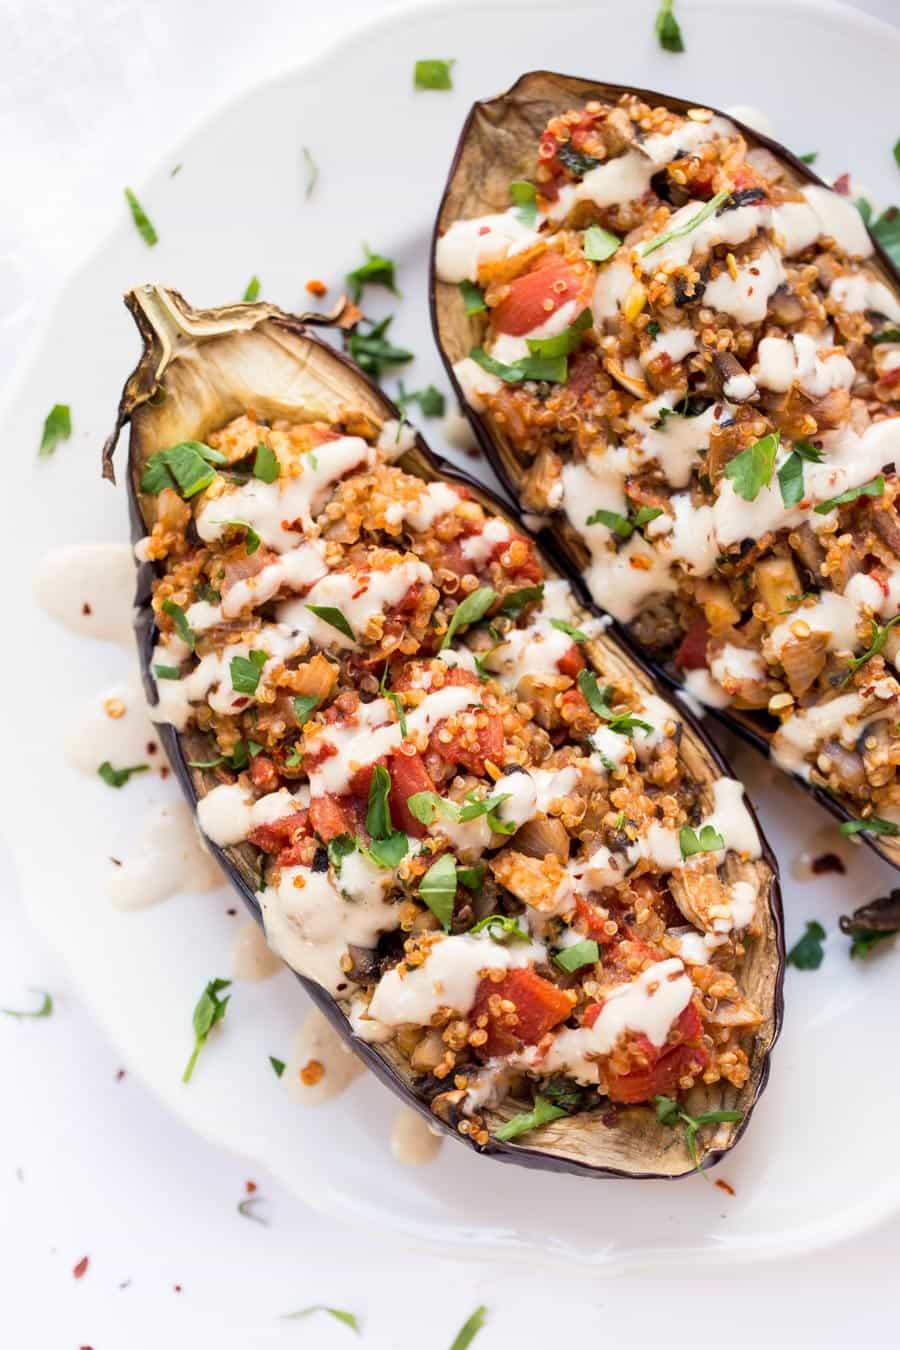 #23 Quinoa Stuffed Eggplant